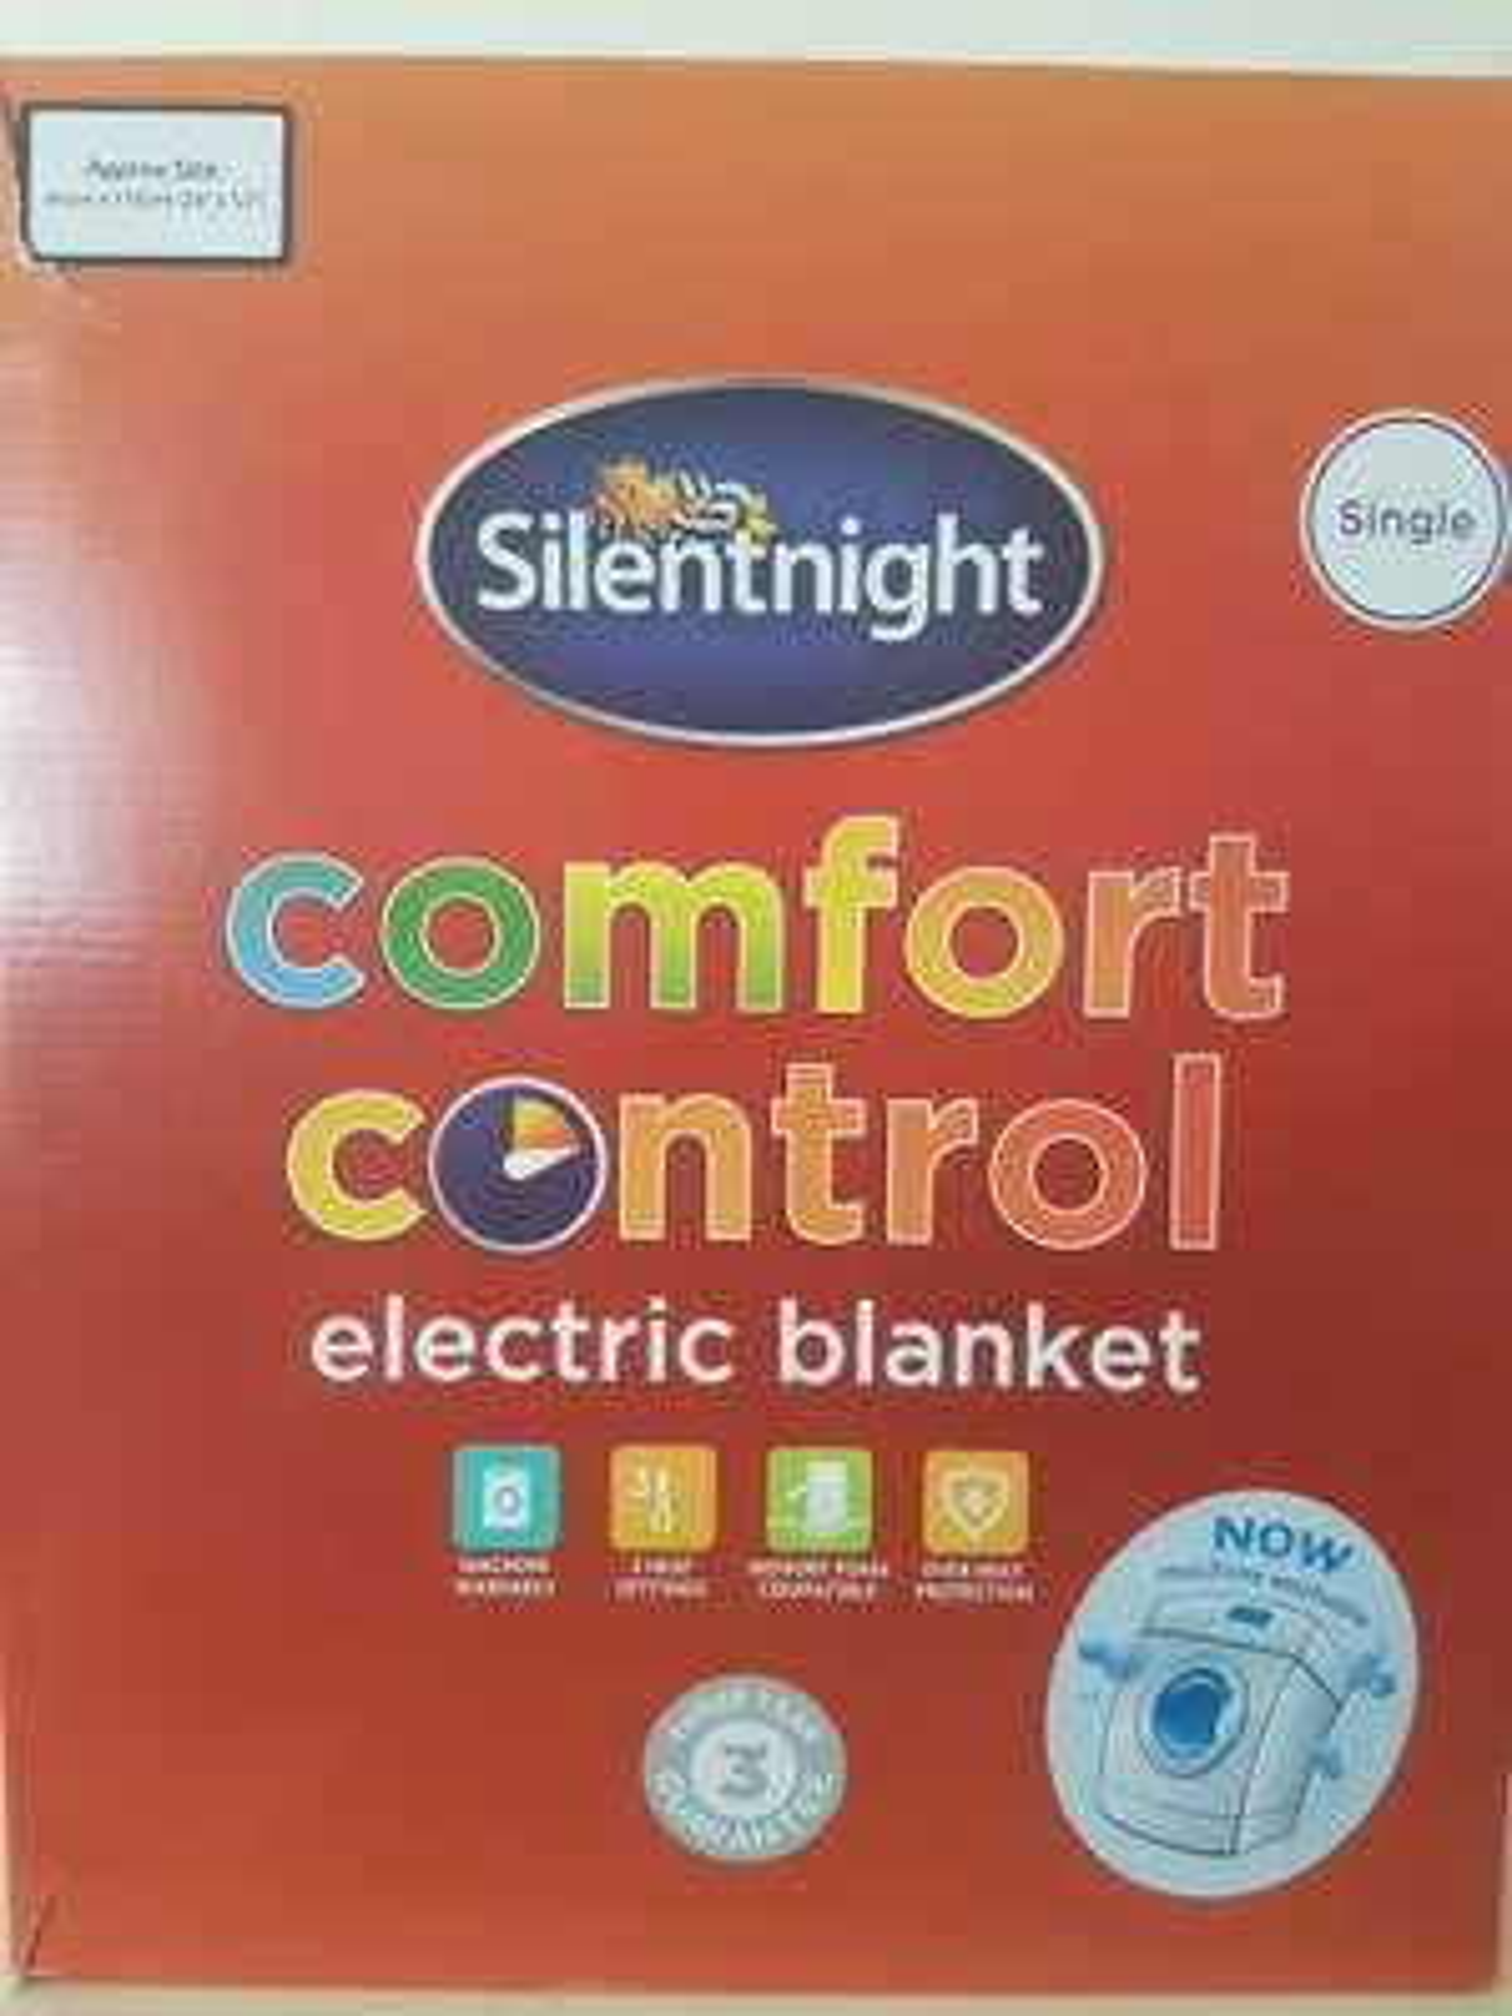 Silentnight single electric blanket £4 Asda instore